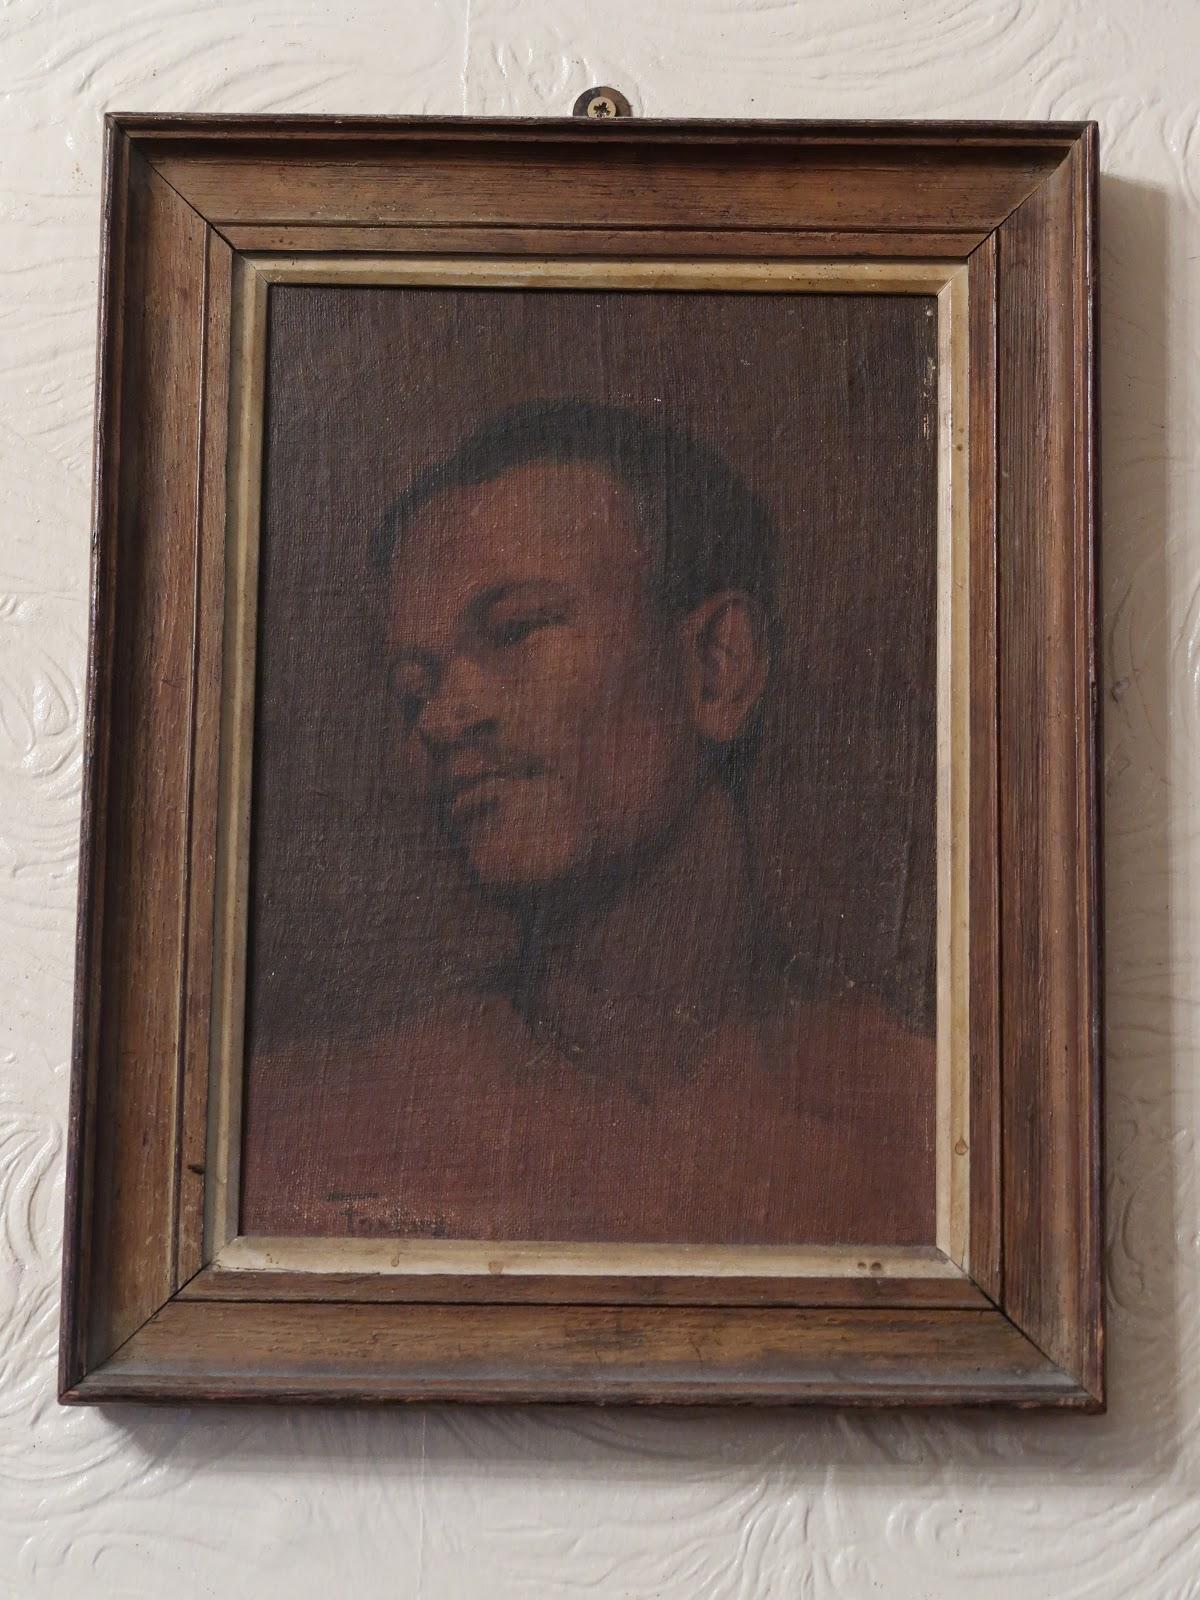 black africans in renaissance europe unknown black portraits in a artist unknown sitter unknown date unknown